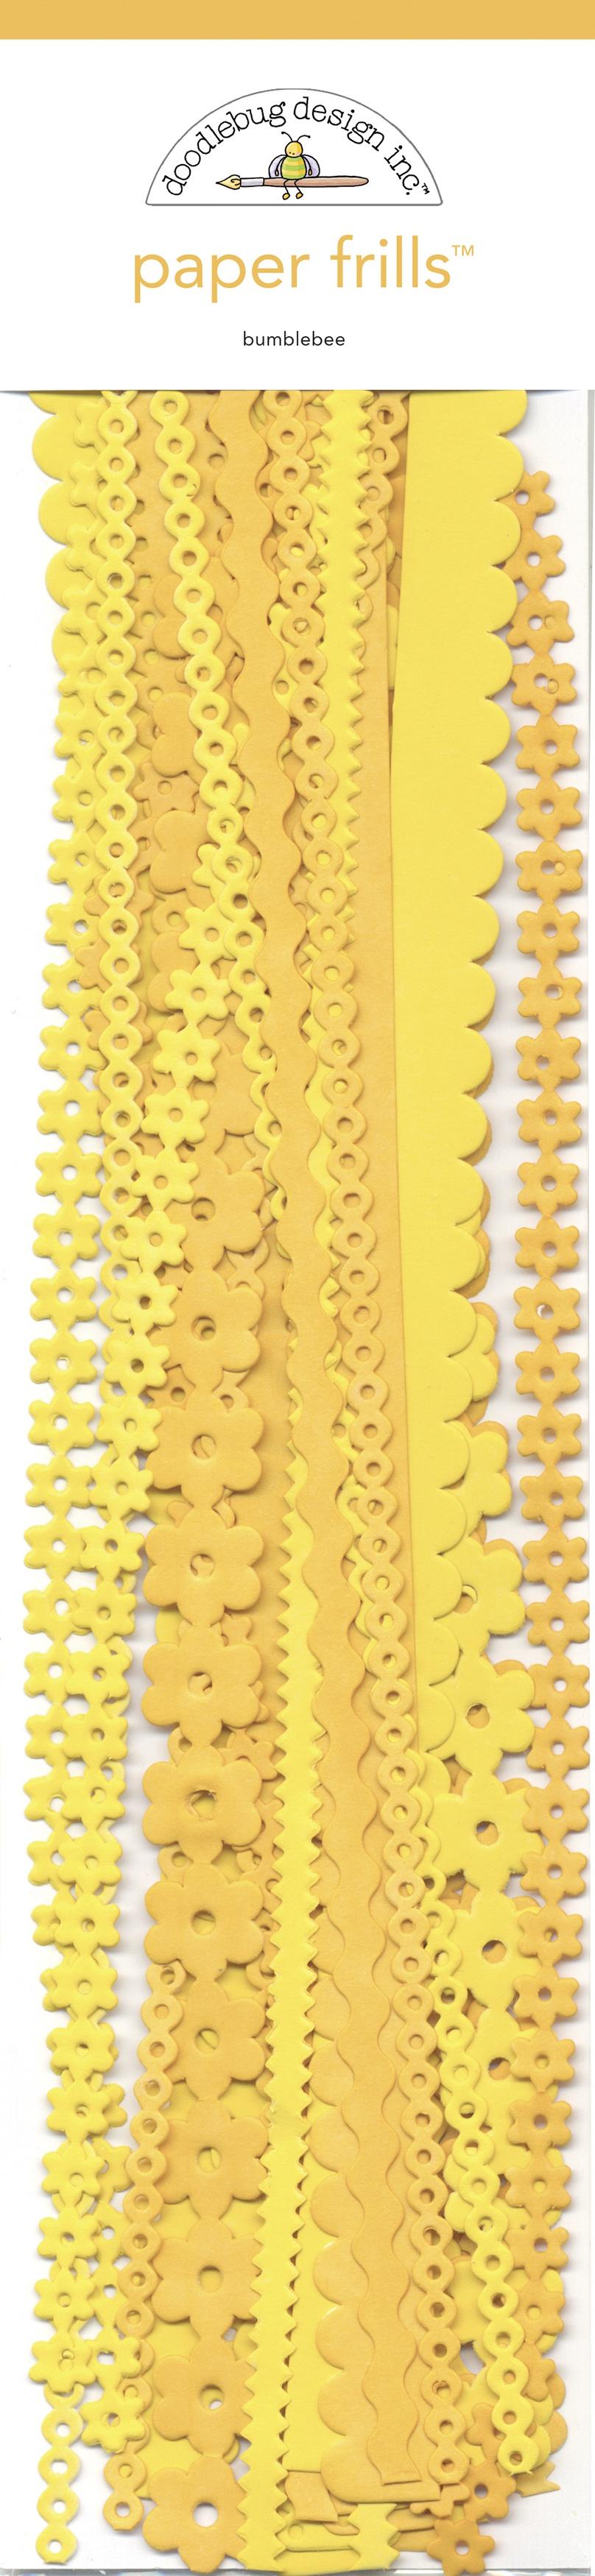 Doodlebug Paper Frills 12 Strips-Bumblebee